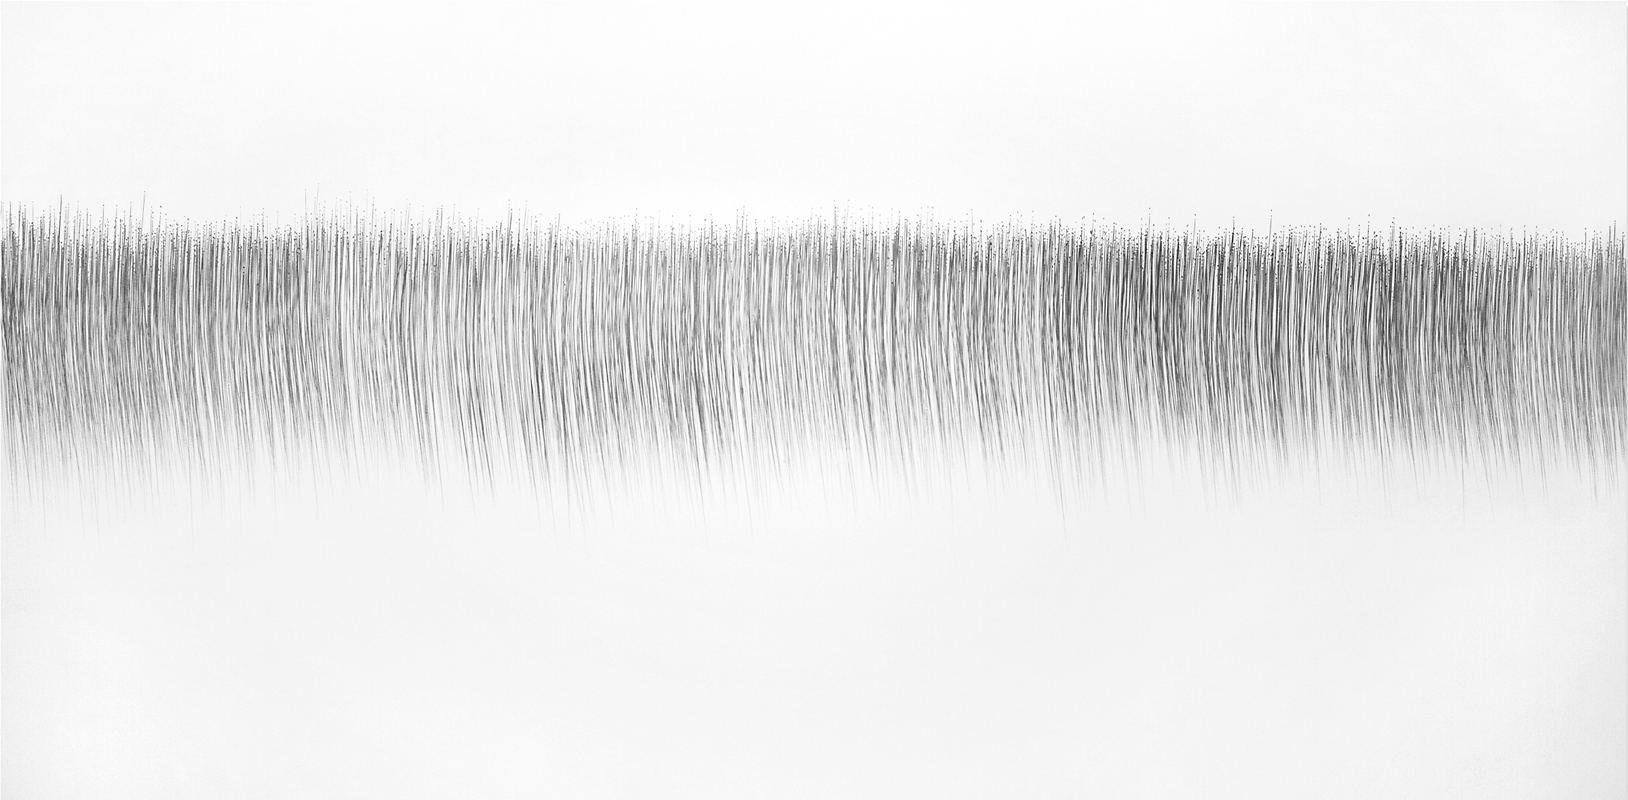 Mooney - Pencil On Panel no 16.jpg